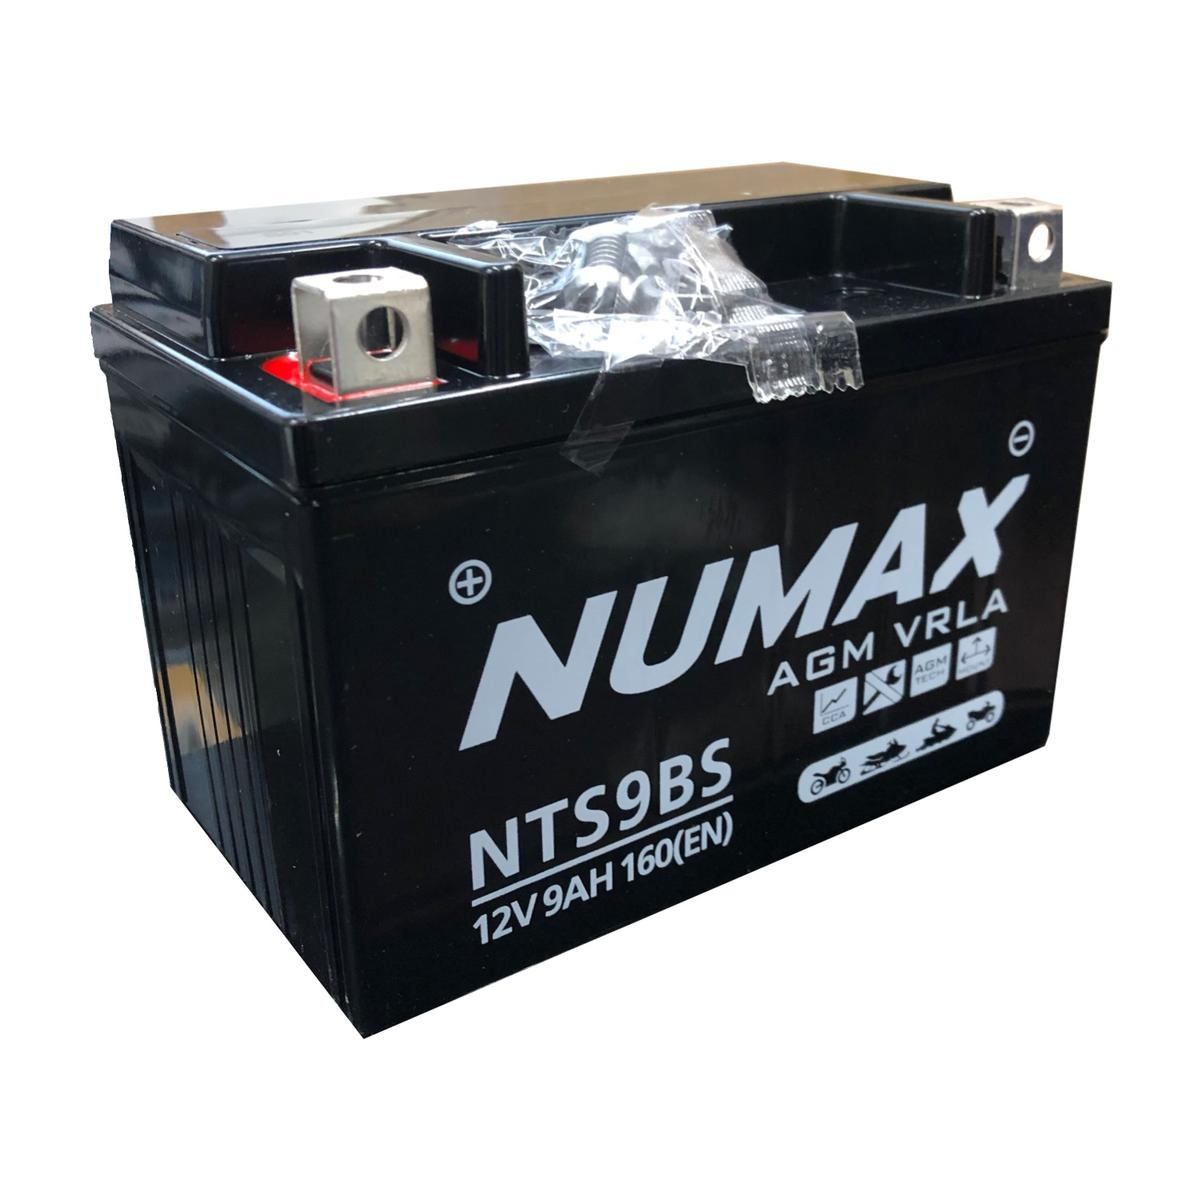 Numax NTS9BS Motorbike Motorcycle Quad Bike ATV Battery Replaces YXT9-4 YXT9-BS